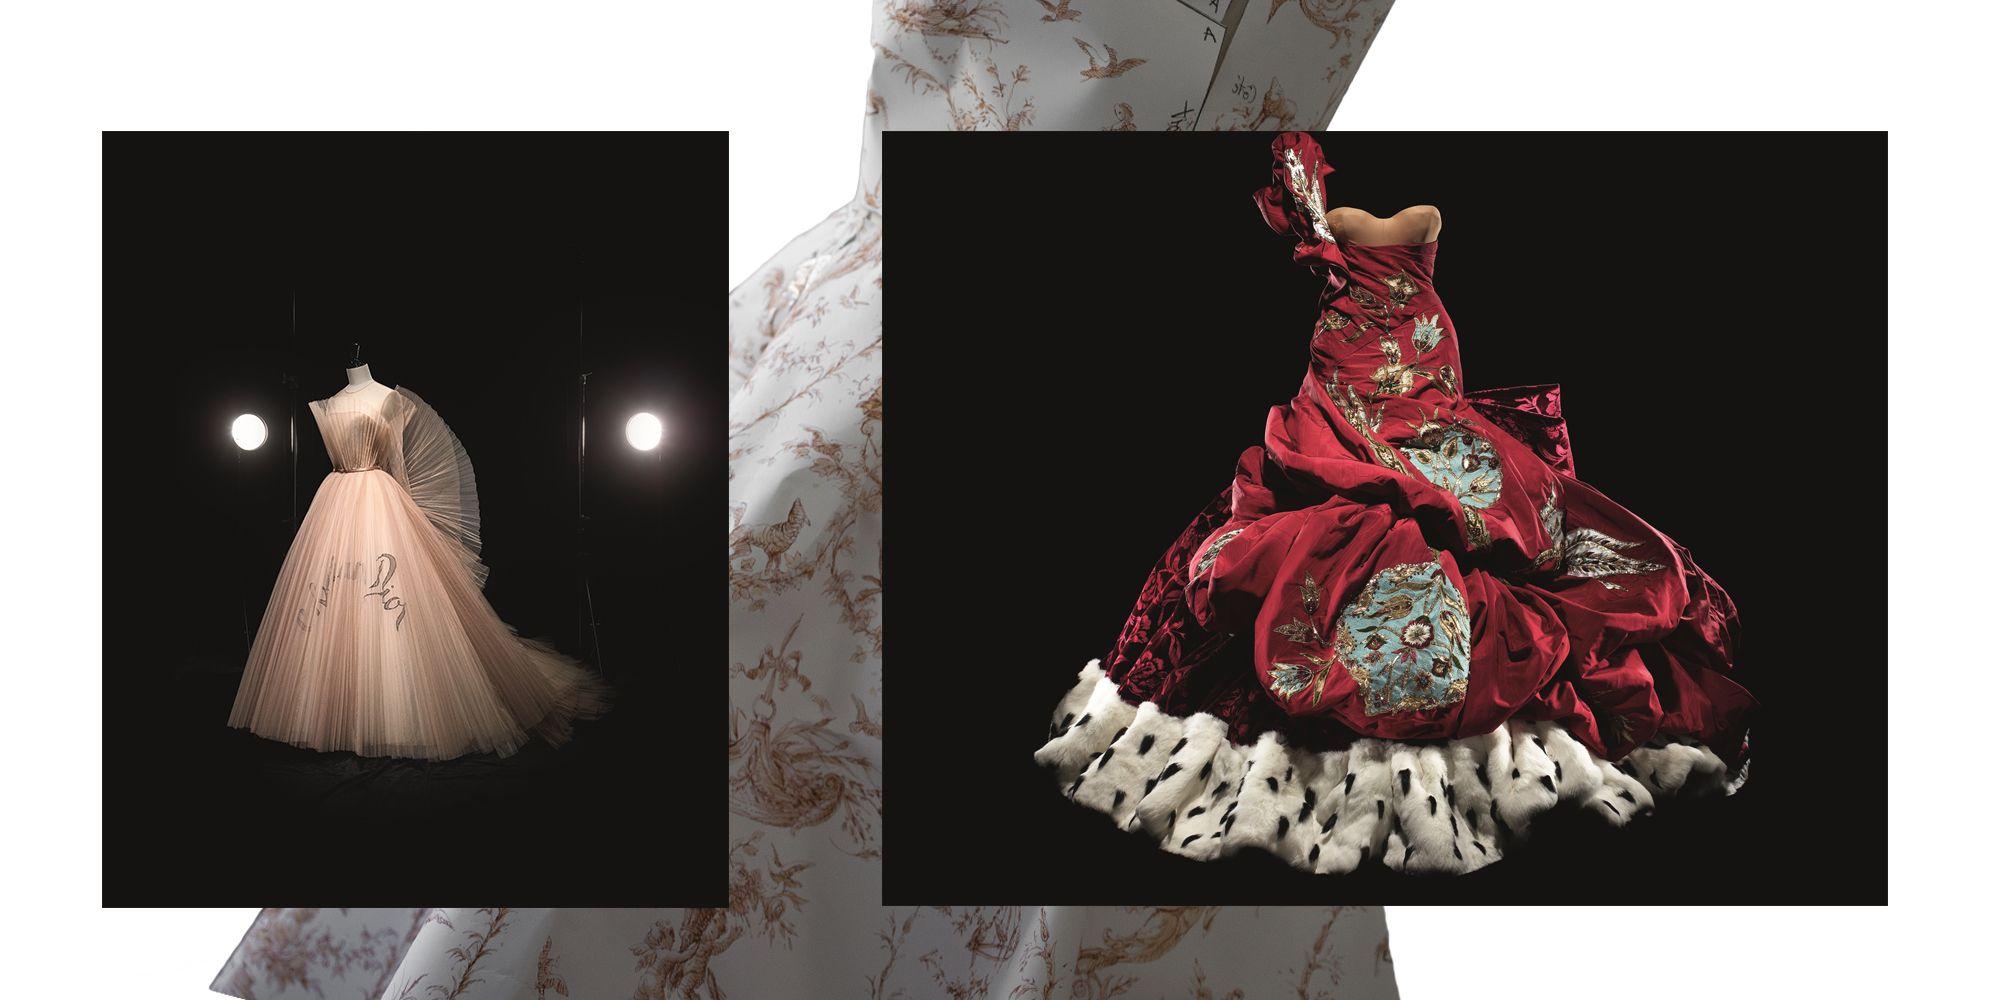 Christian Dior: Designer Of Dreams Exhibition